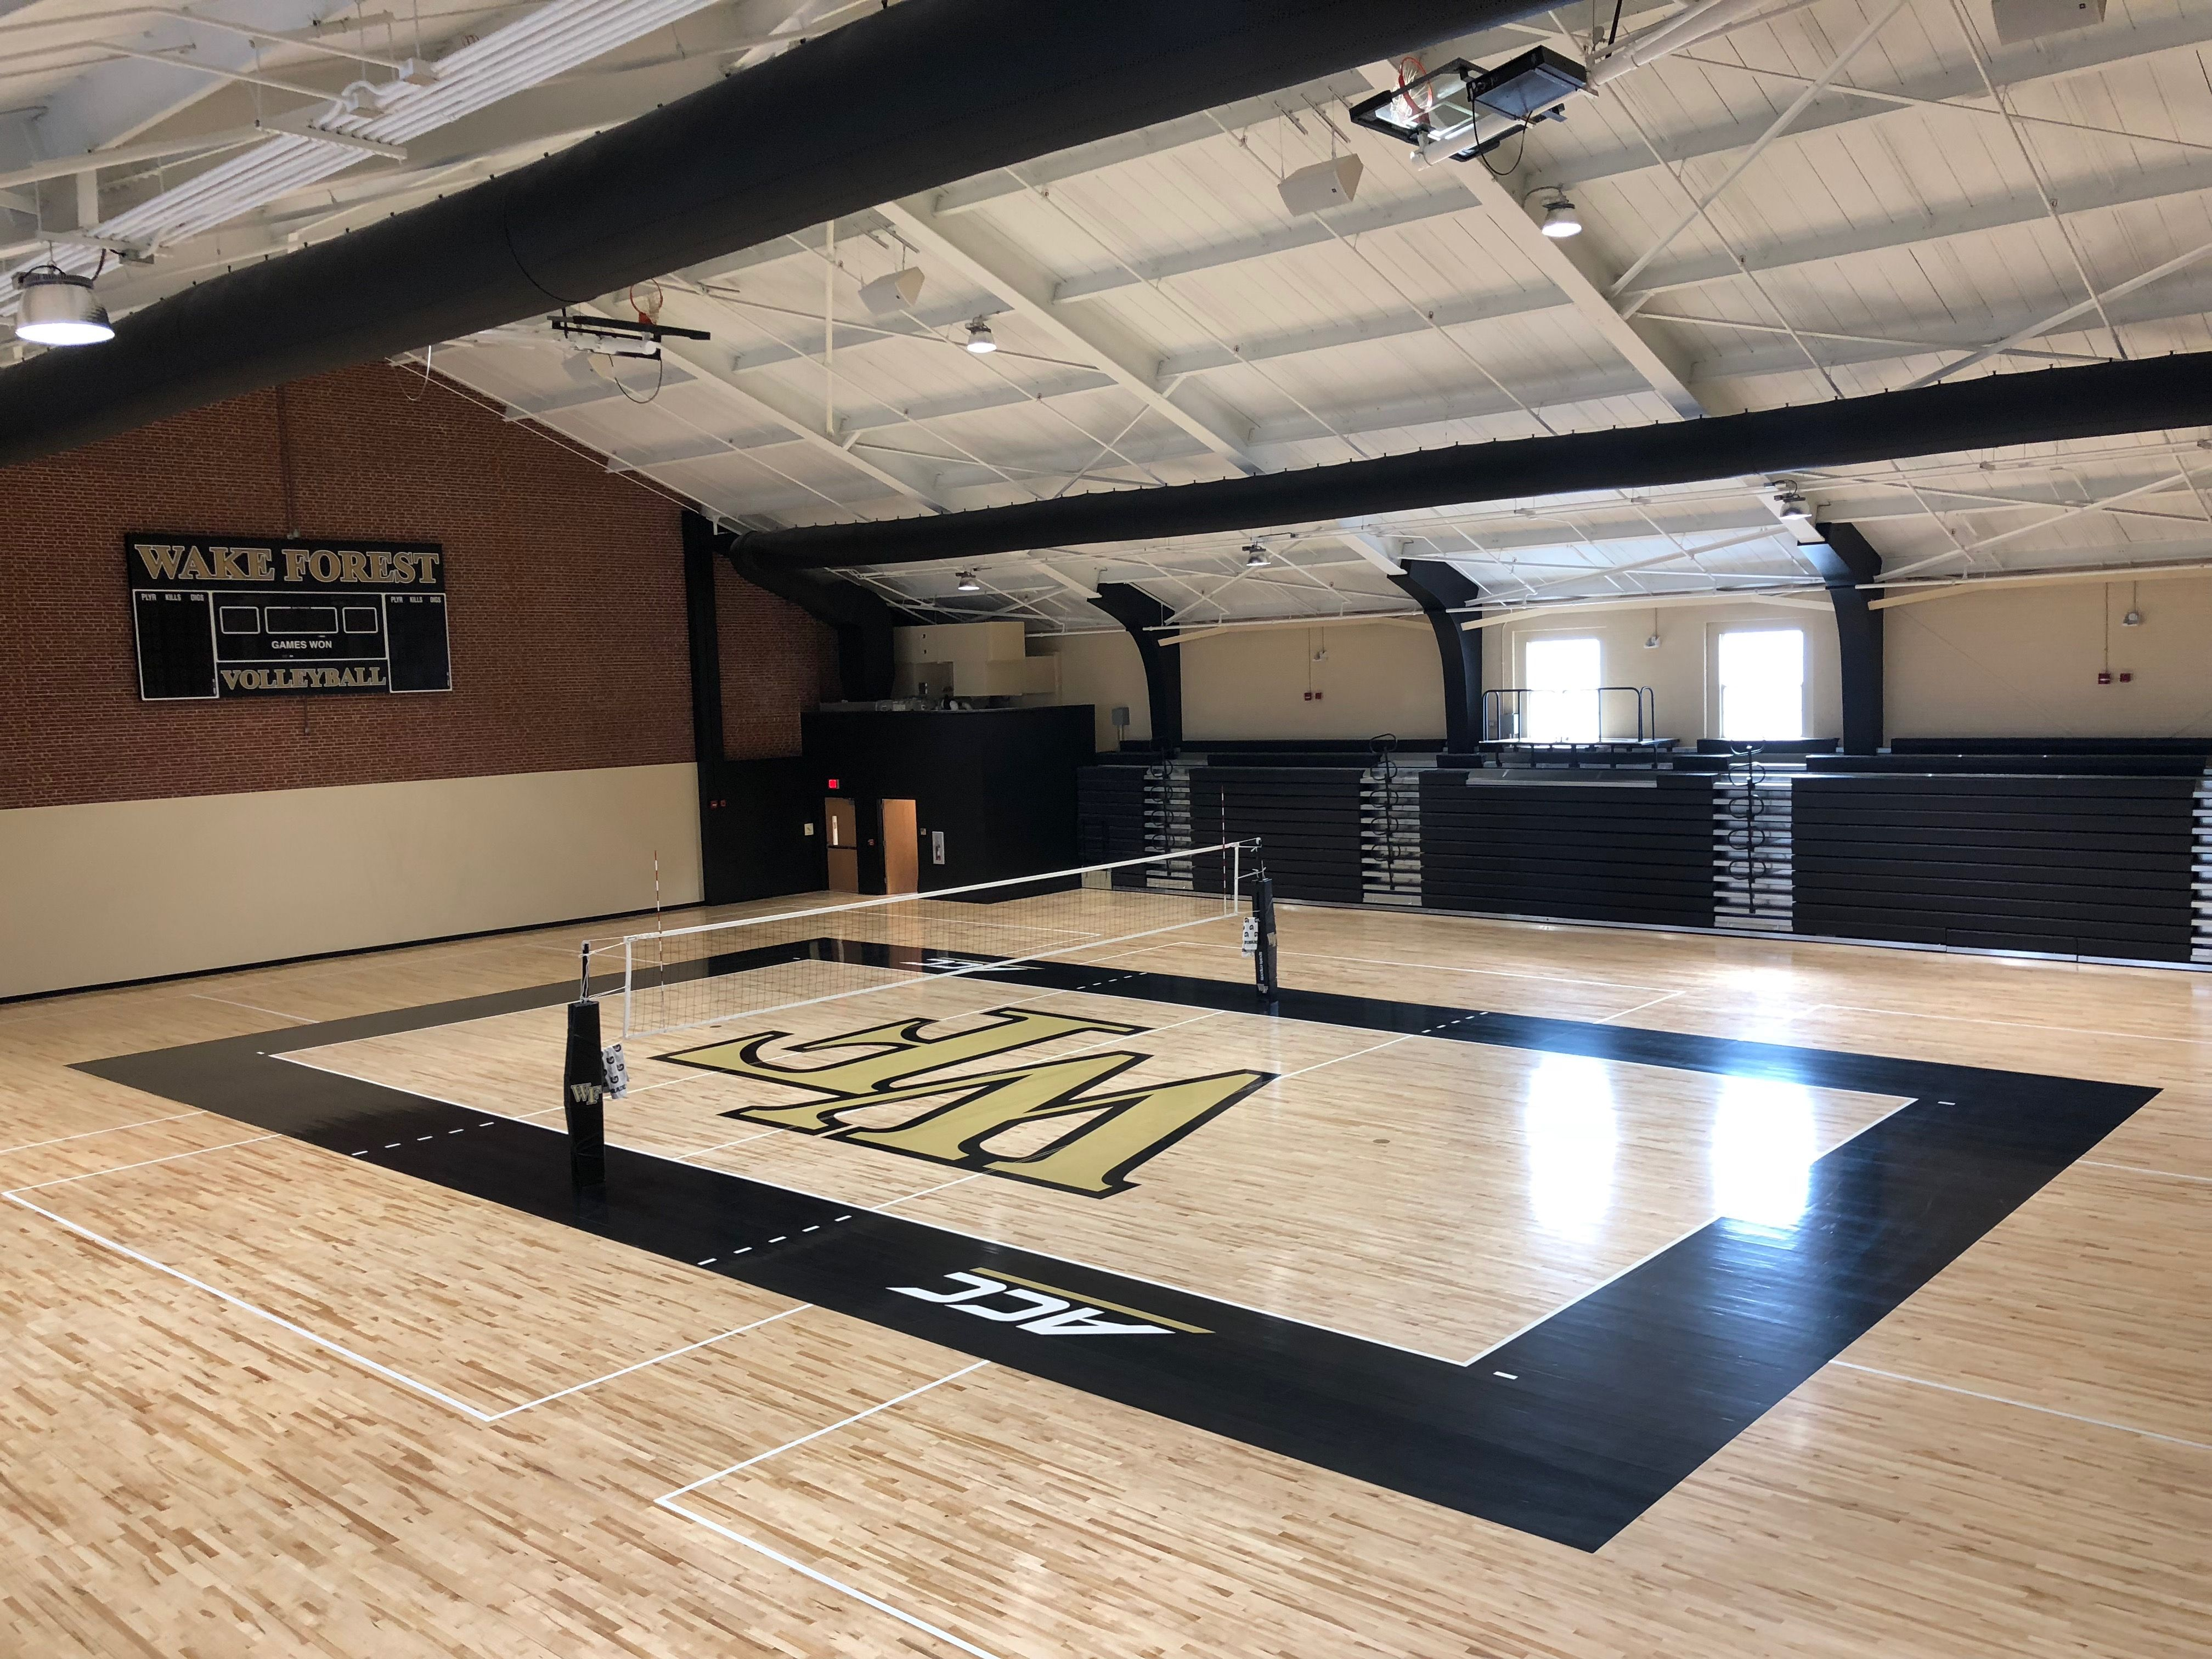 Wake Forest University Volleyball Sicarbonnation Volleyball Net Volleyball Volleyball Equipment